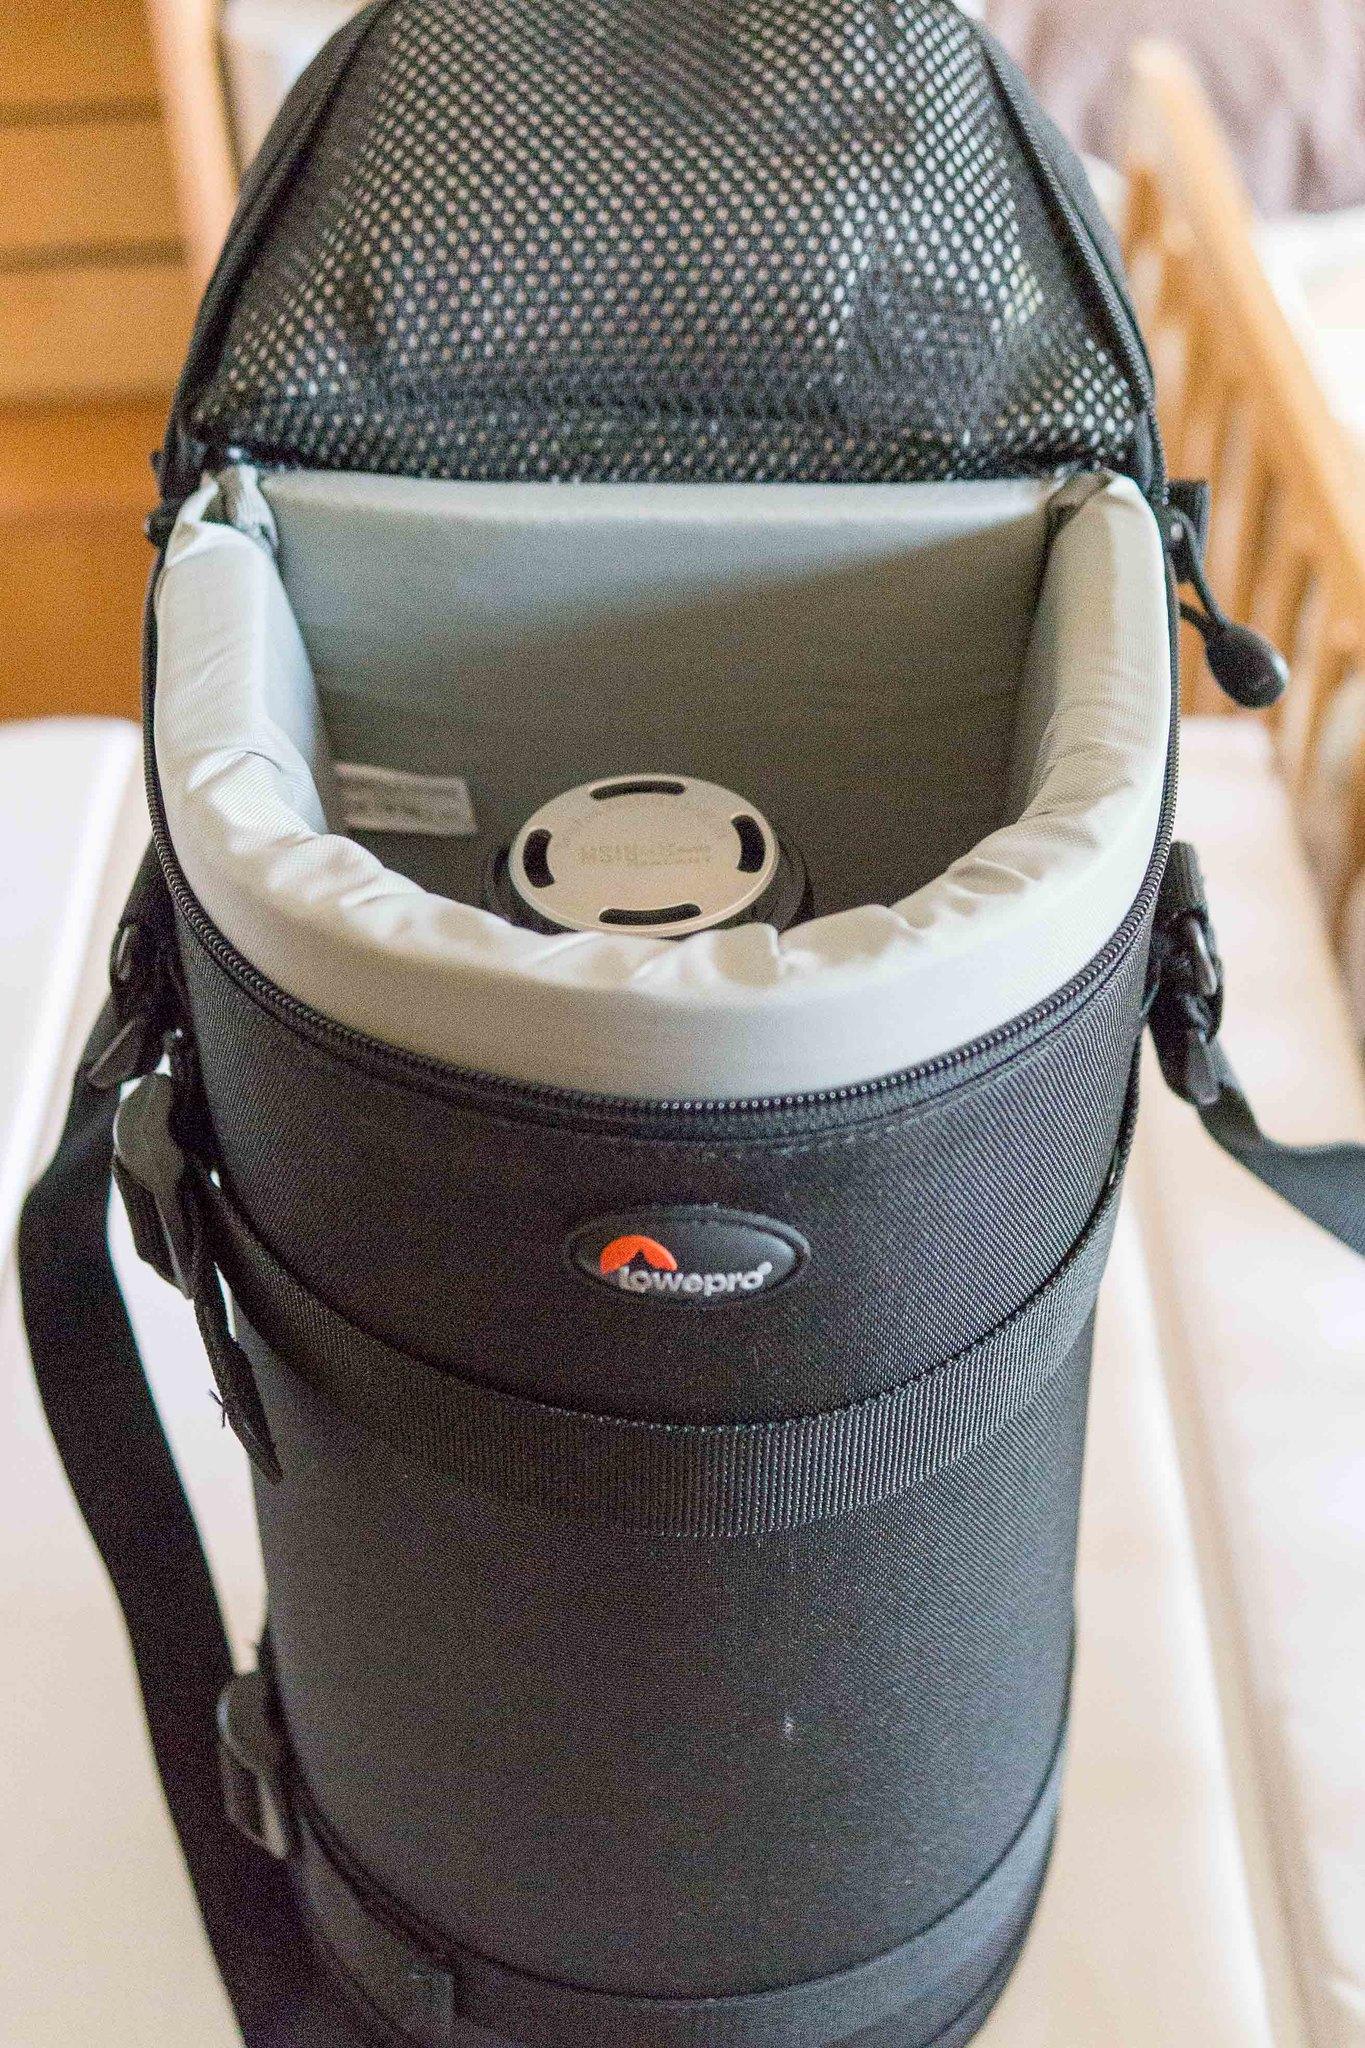 Lowepro Carry Case